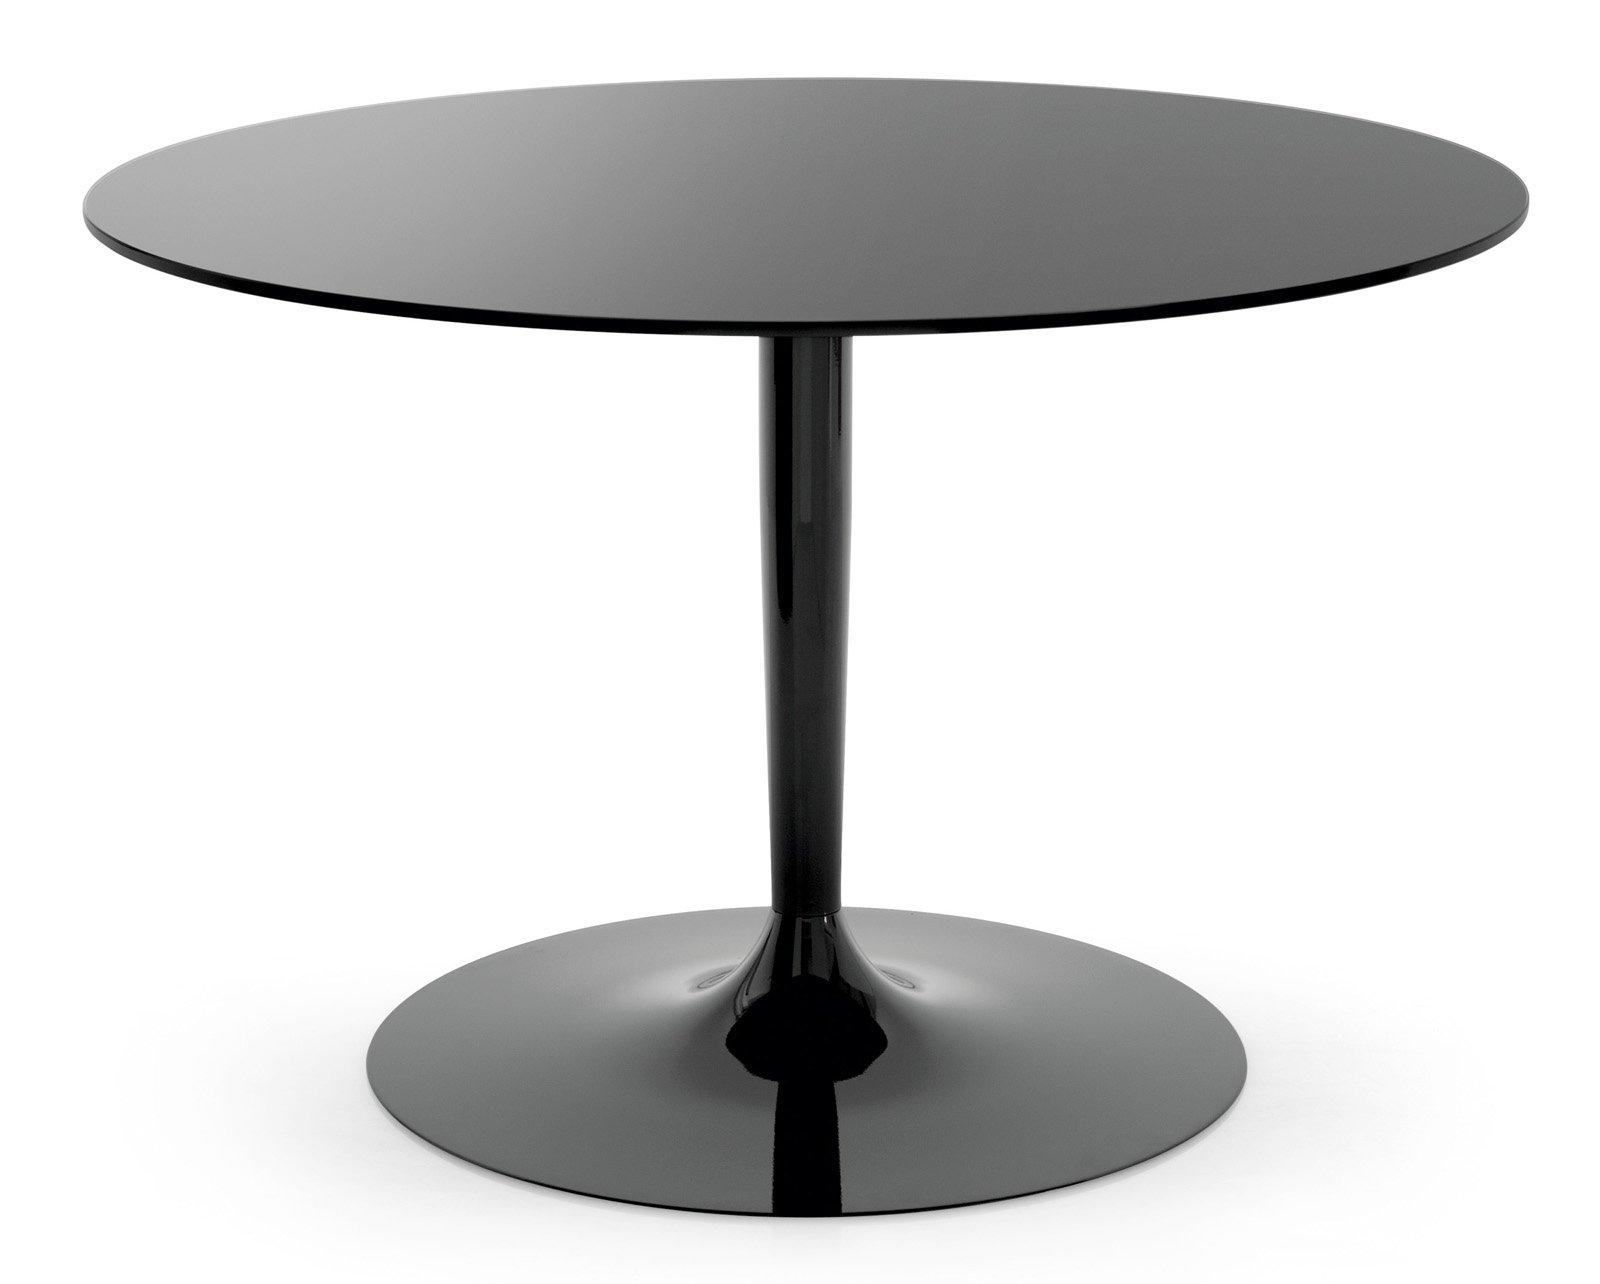 Tavoli da cucina: quadrati, tondi o rettangolari? recensioni ed offerte